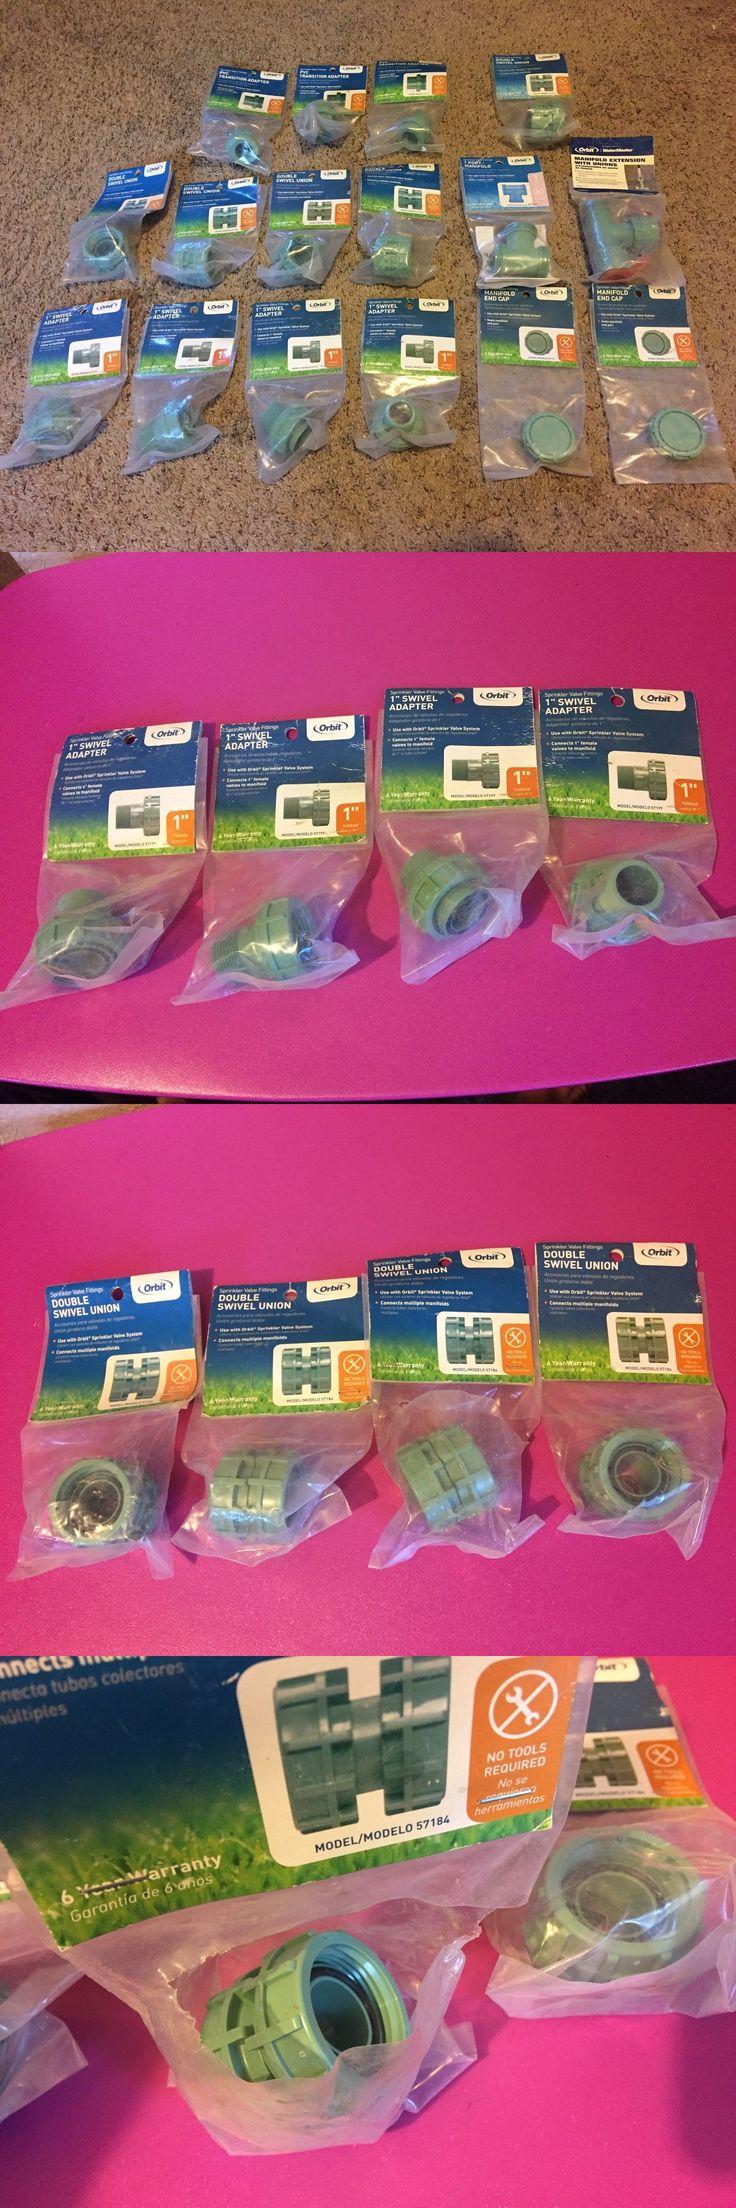 Valves 75673: Lot Of 16 Orbit Swivel Adapter Valve Manifold Parts Sprinkler Systems Valves Lot -> BUY IT NOW ONLY: $95 on eBay!